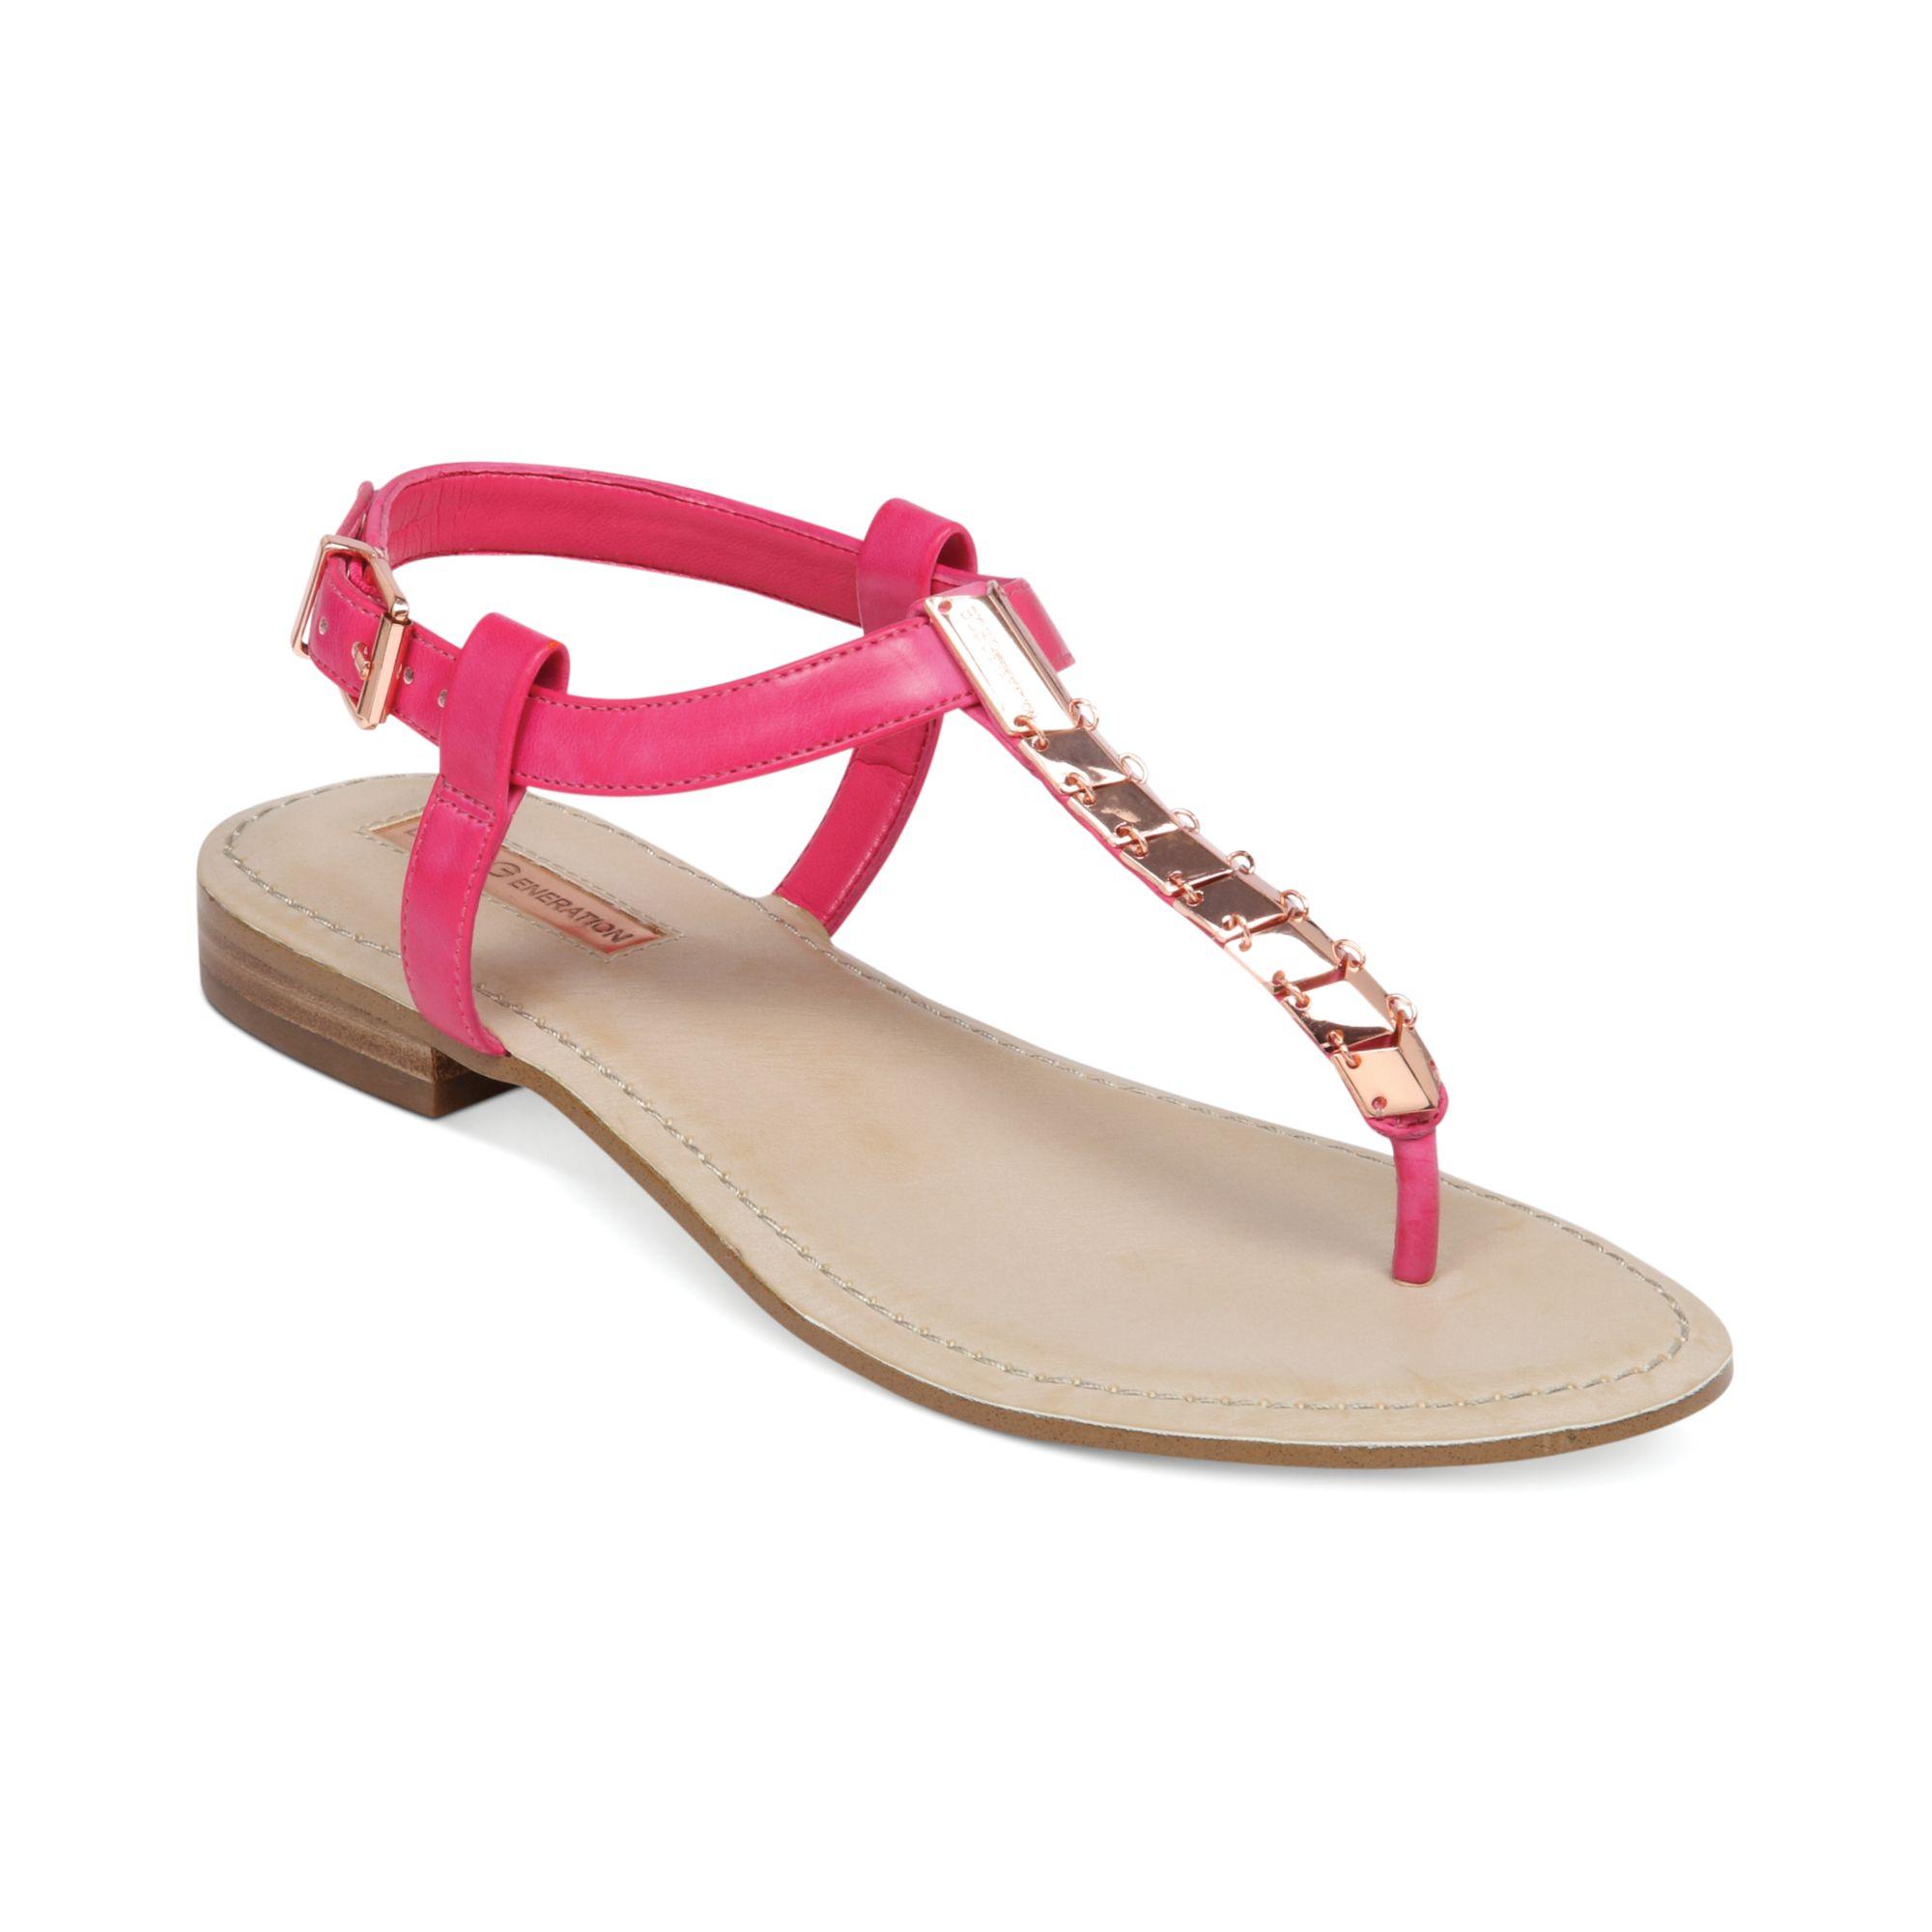 Giancarlo Paoli Shoes Canada